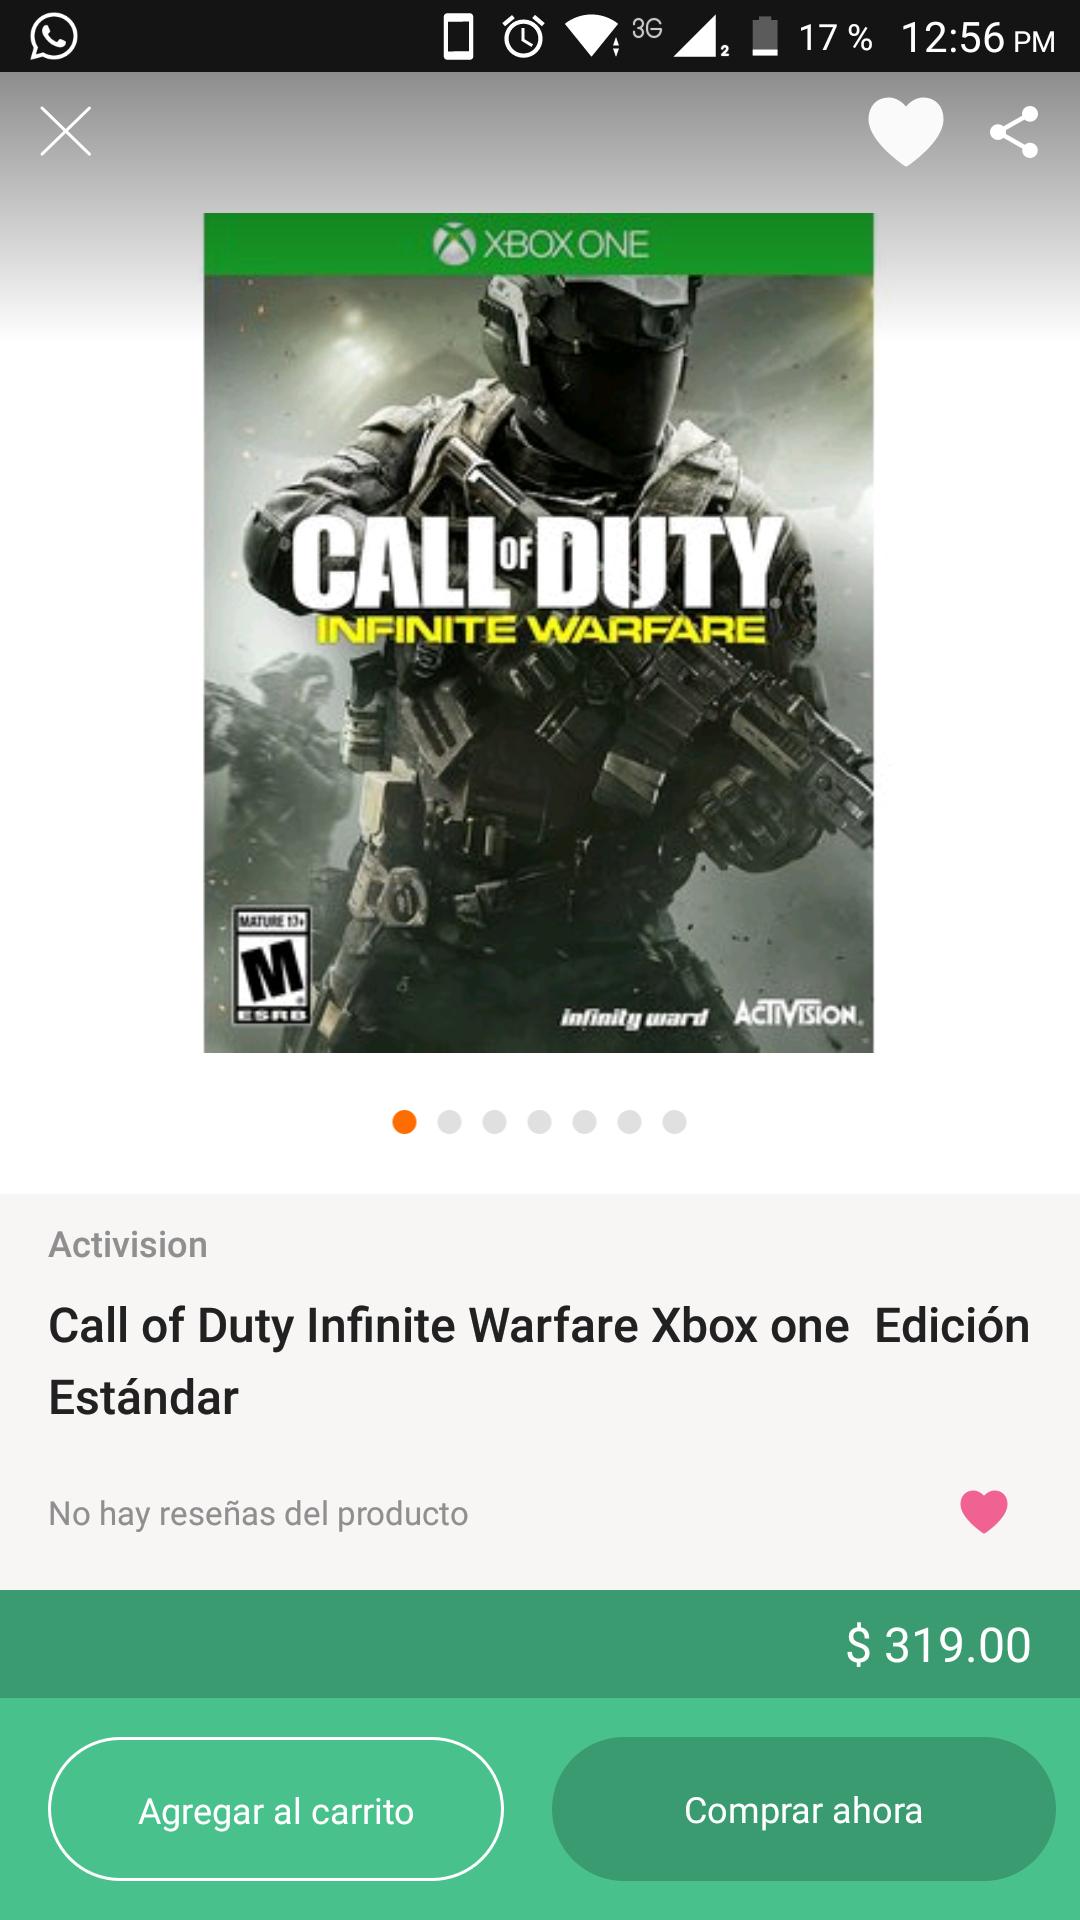 Linio: Call of Duty Infinite Warfare para Xbox One Edición Estándar